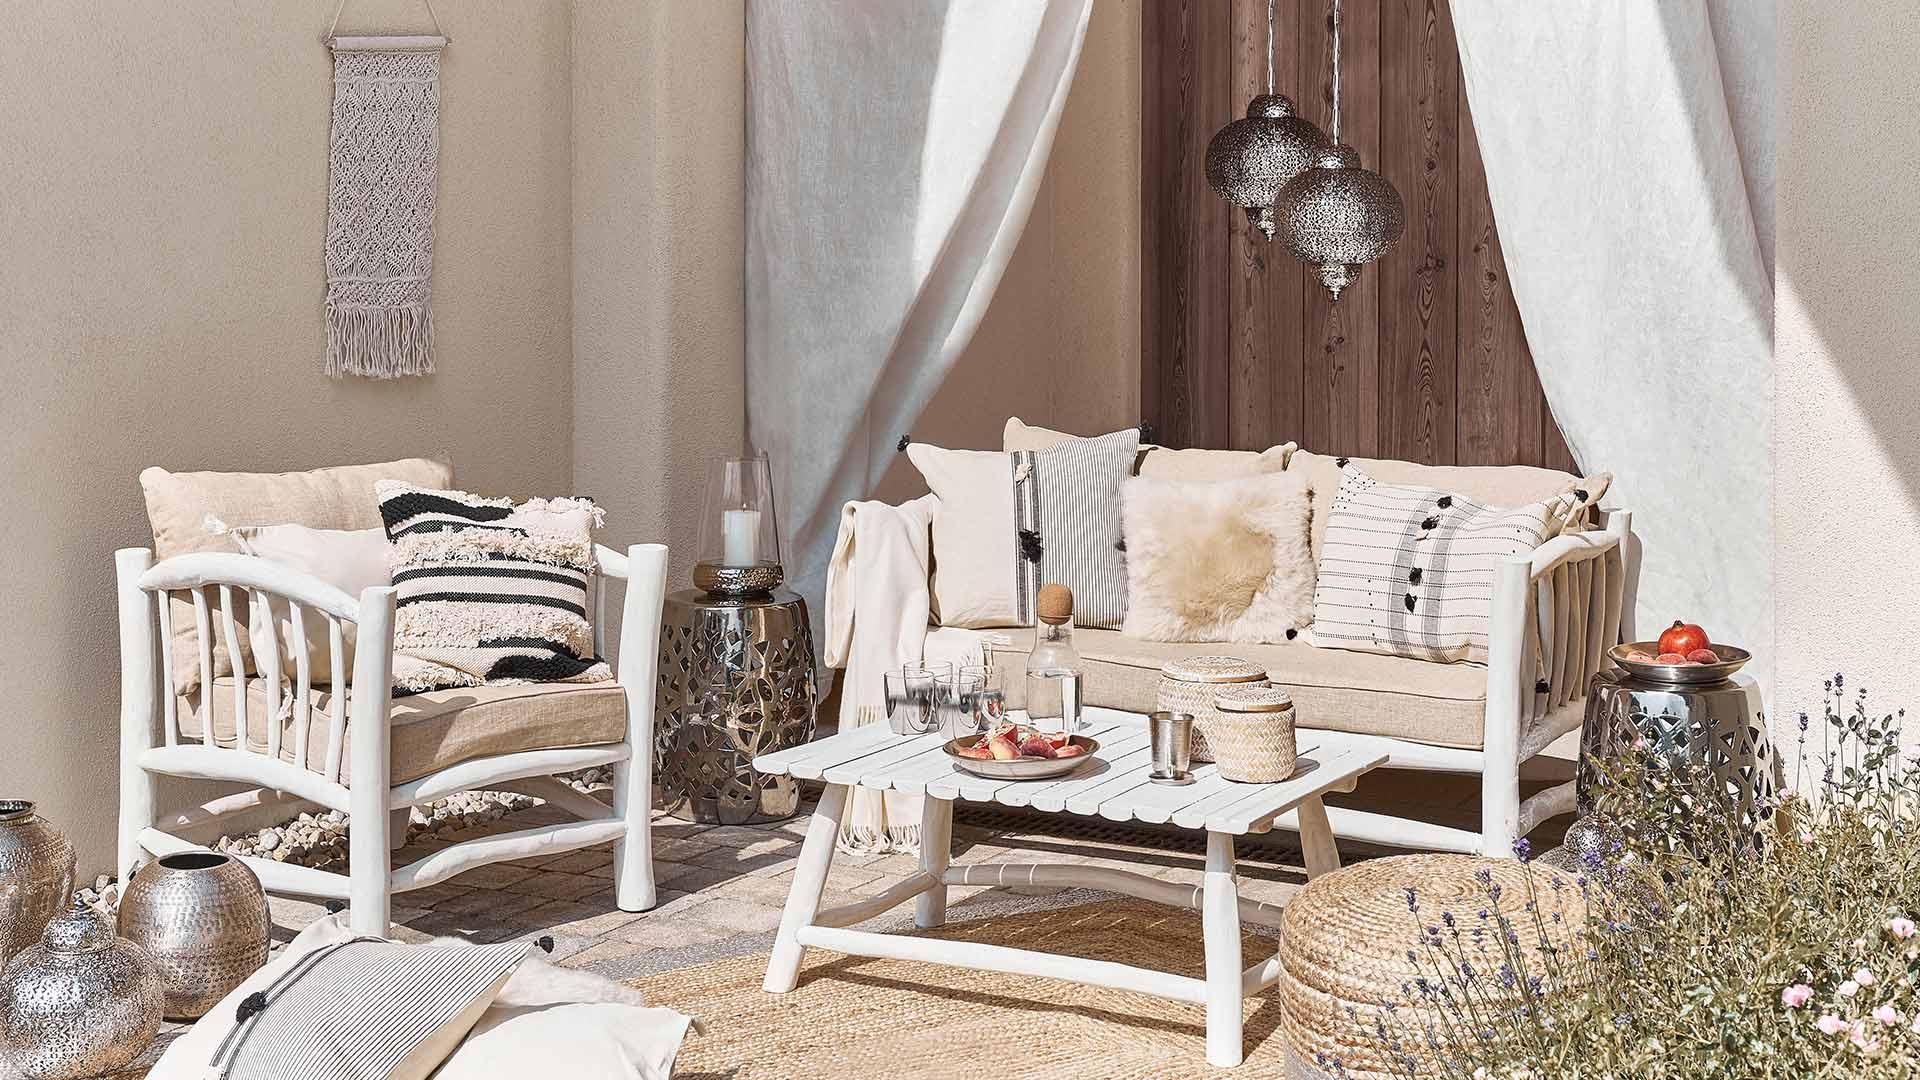 White Morocco